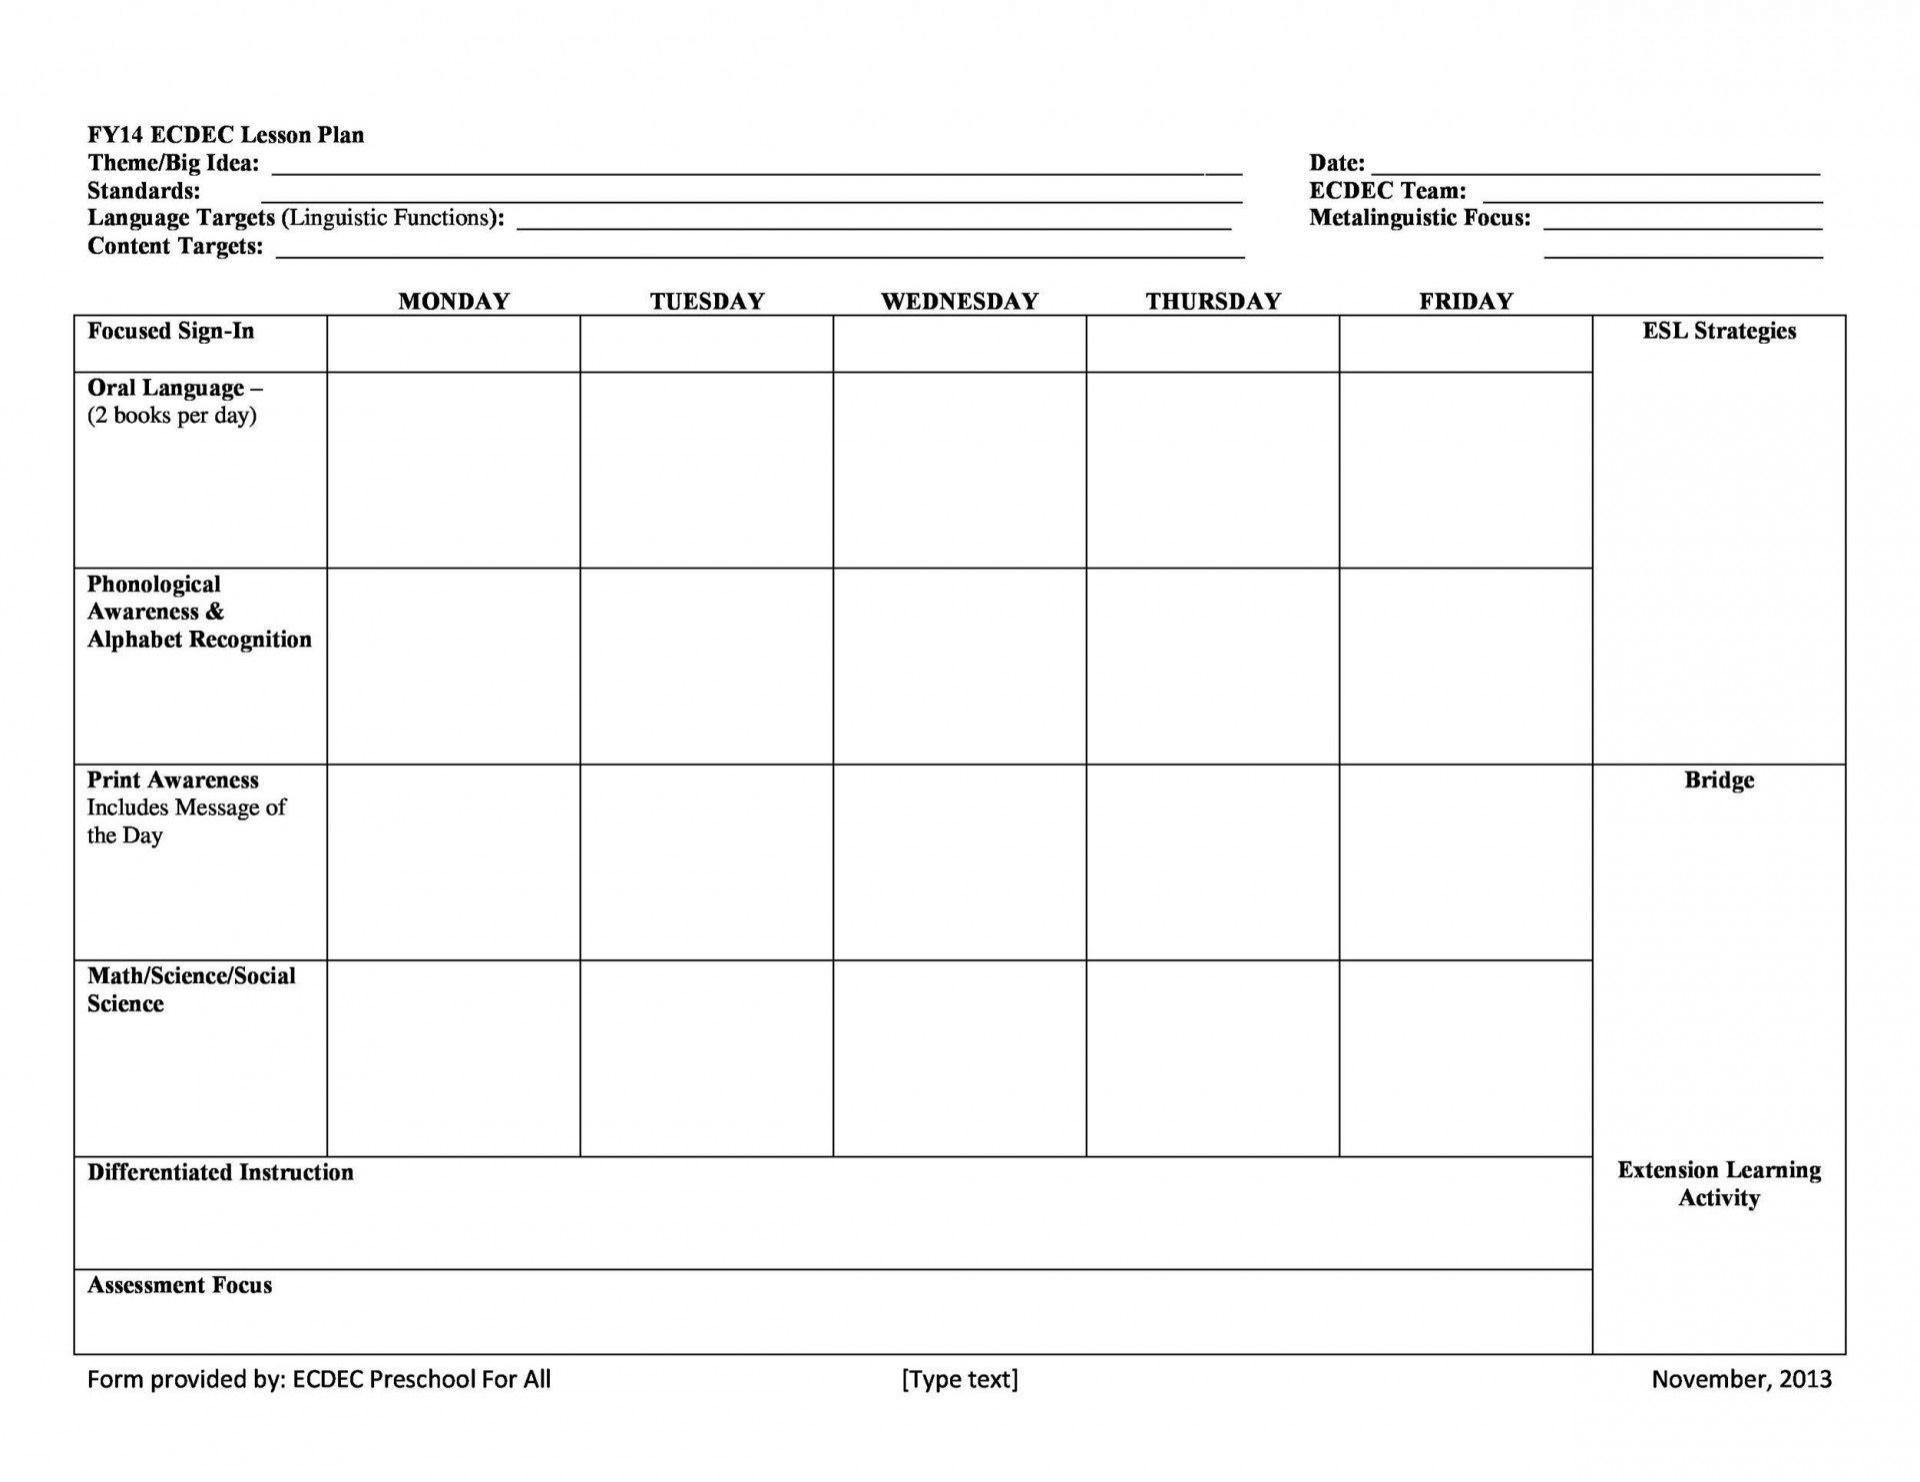 001 Staggering Pre K Lesson Plan Sample High Definition  Nc Template Ga Pre-k1920